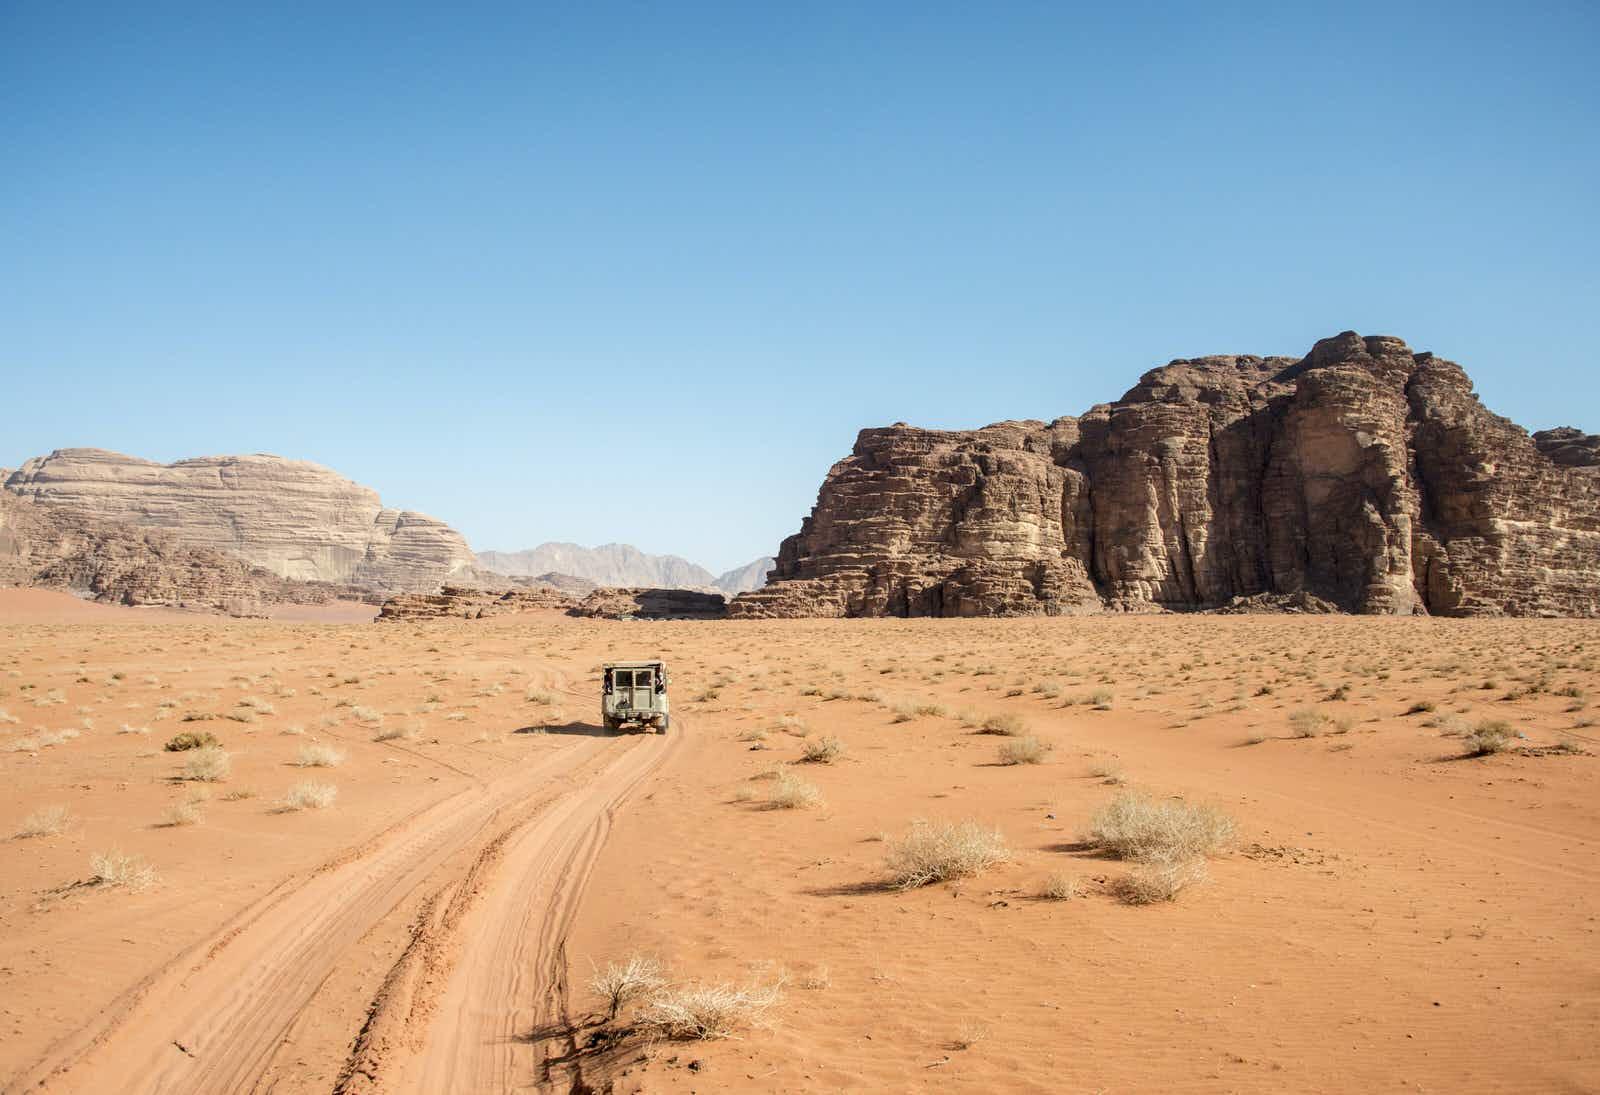 Pick-up truck in the desert in Wadi Rum, Jordan